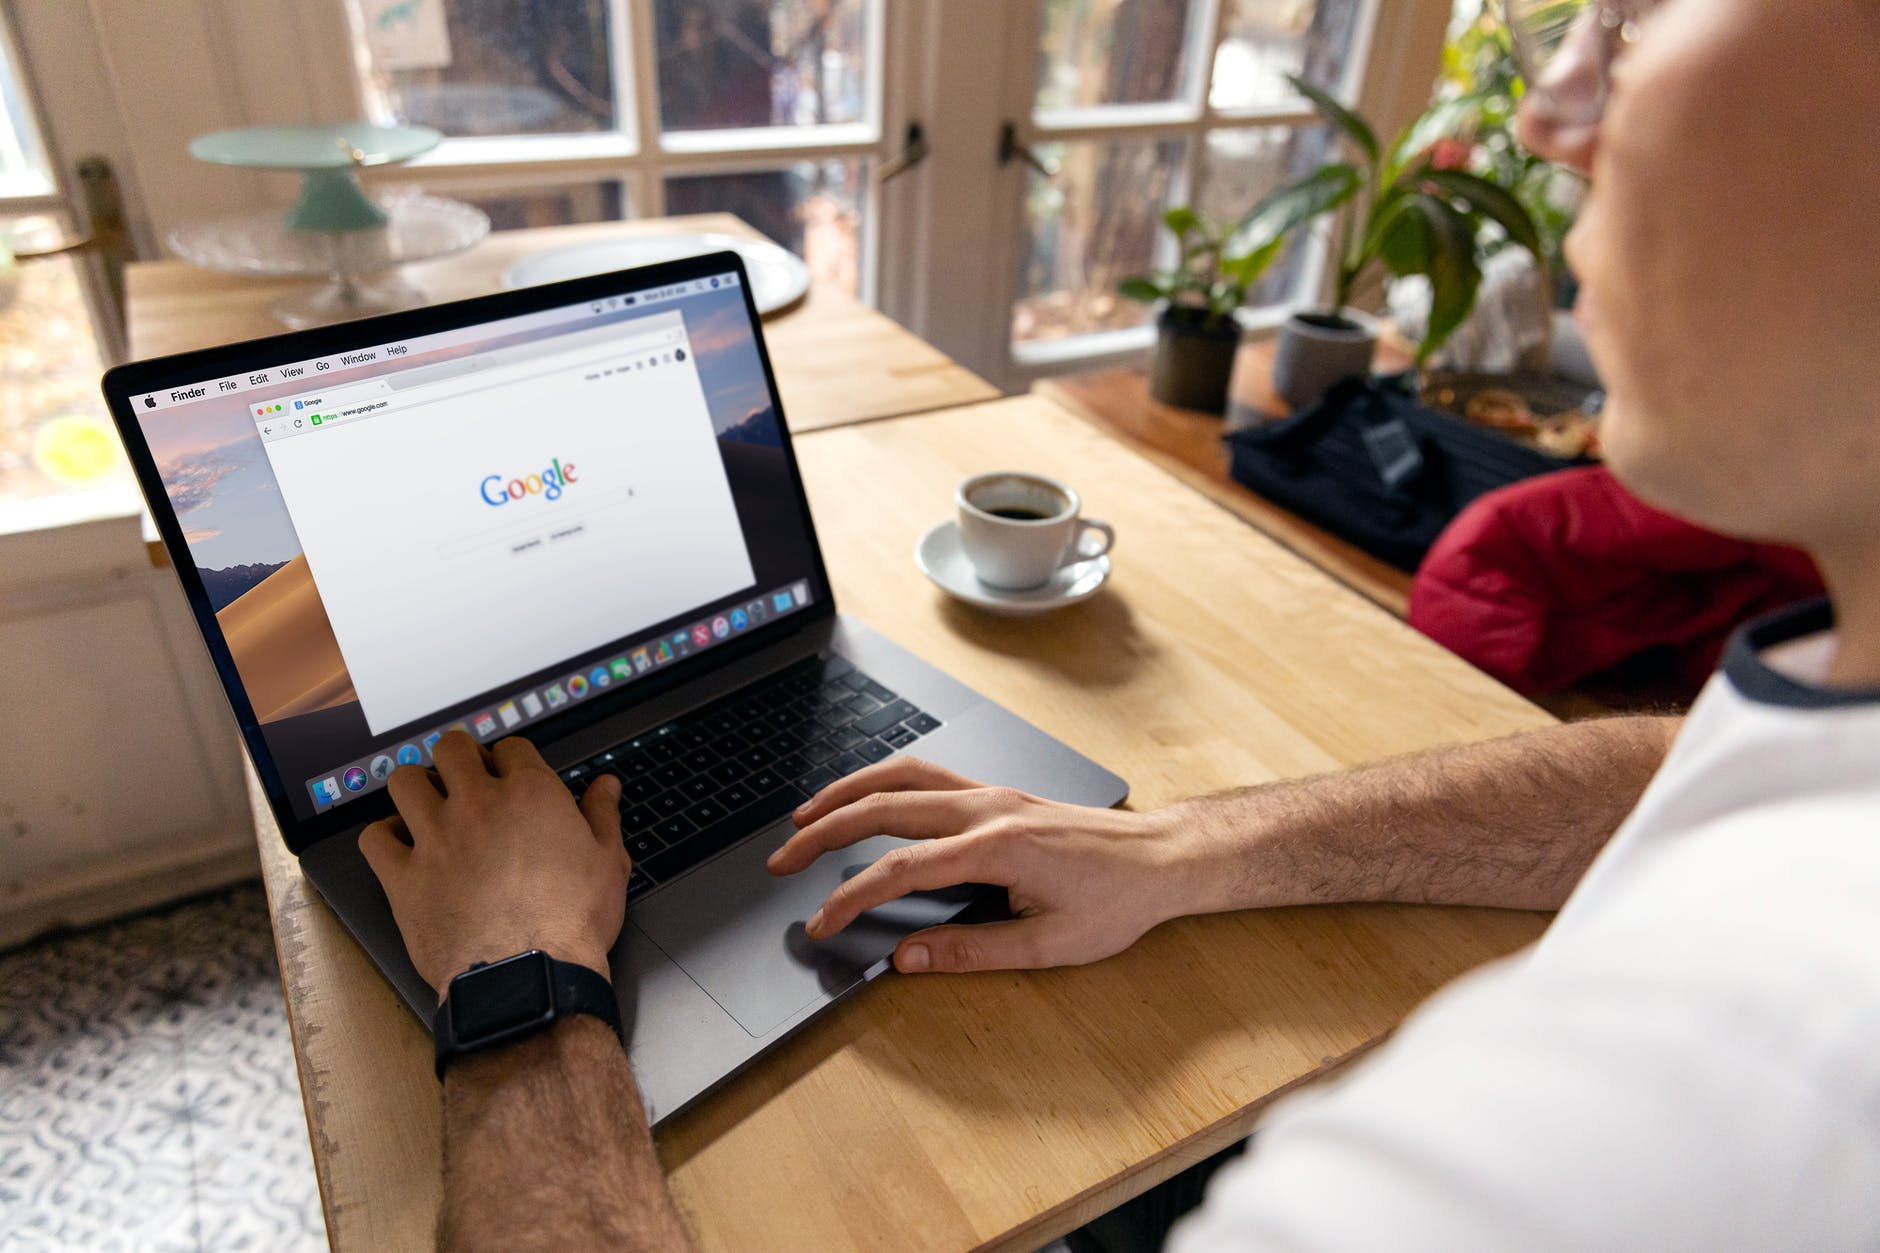 google ordinateur portable